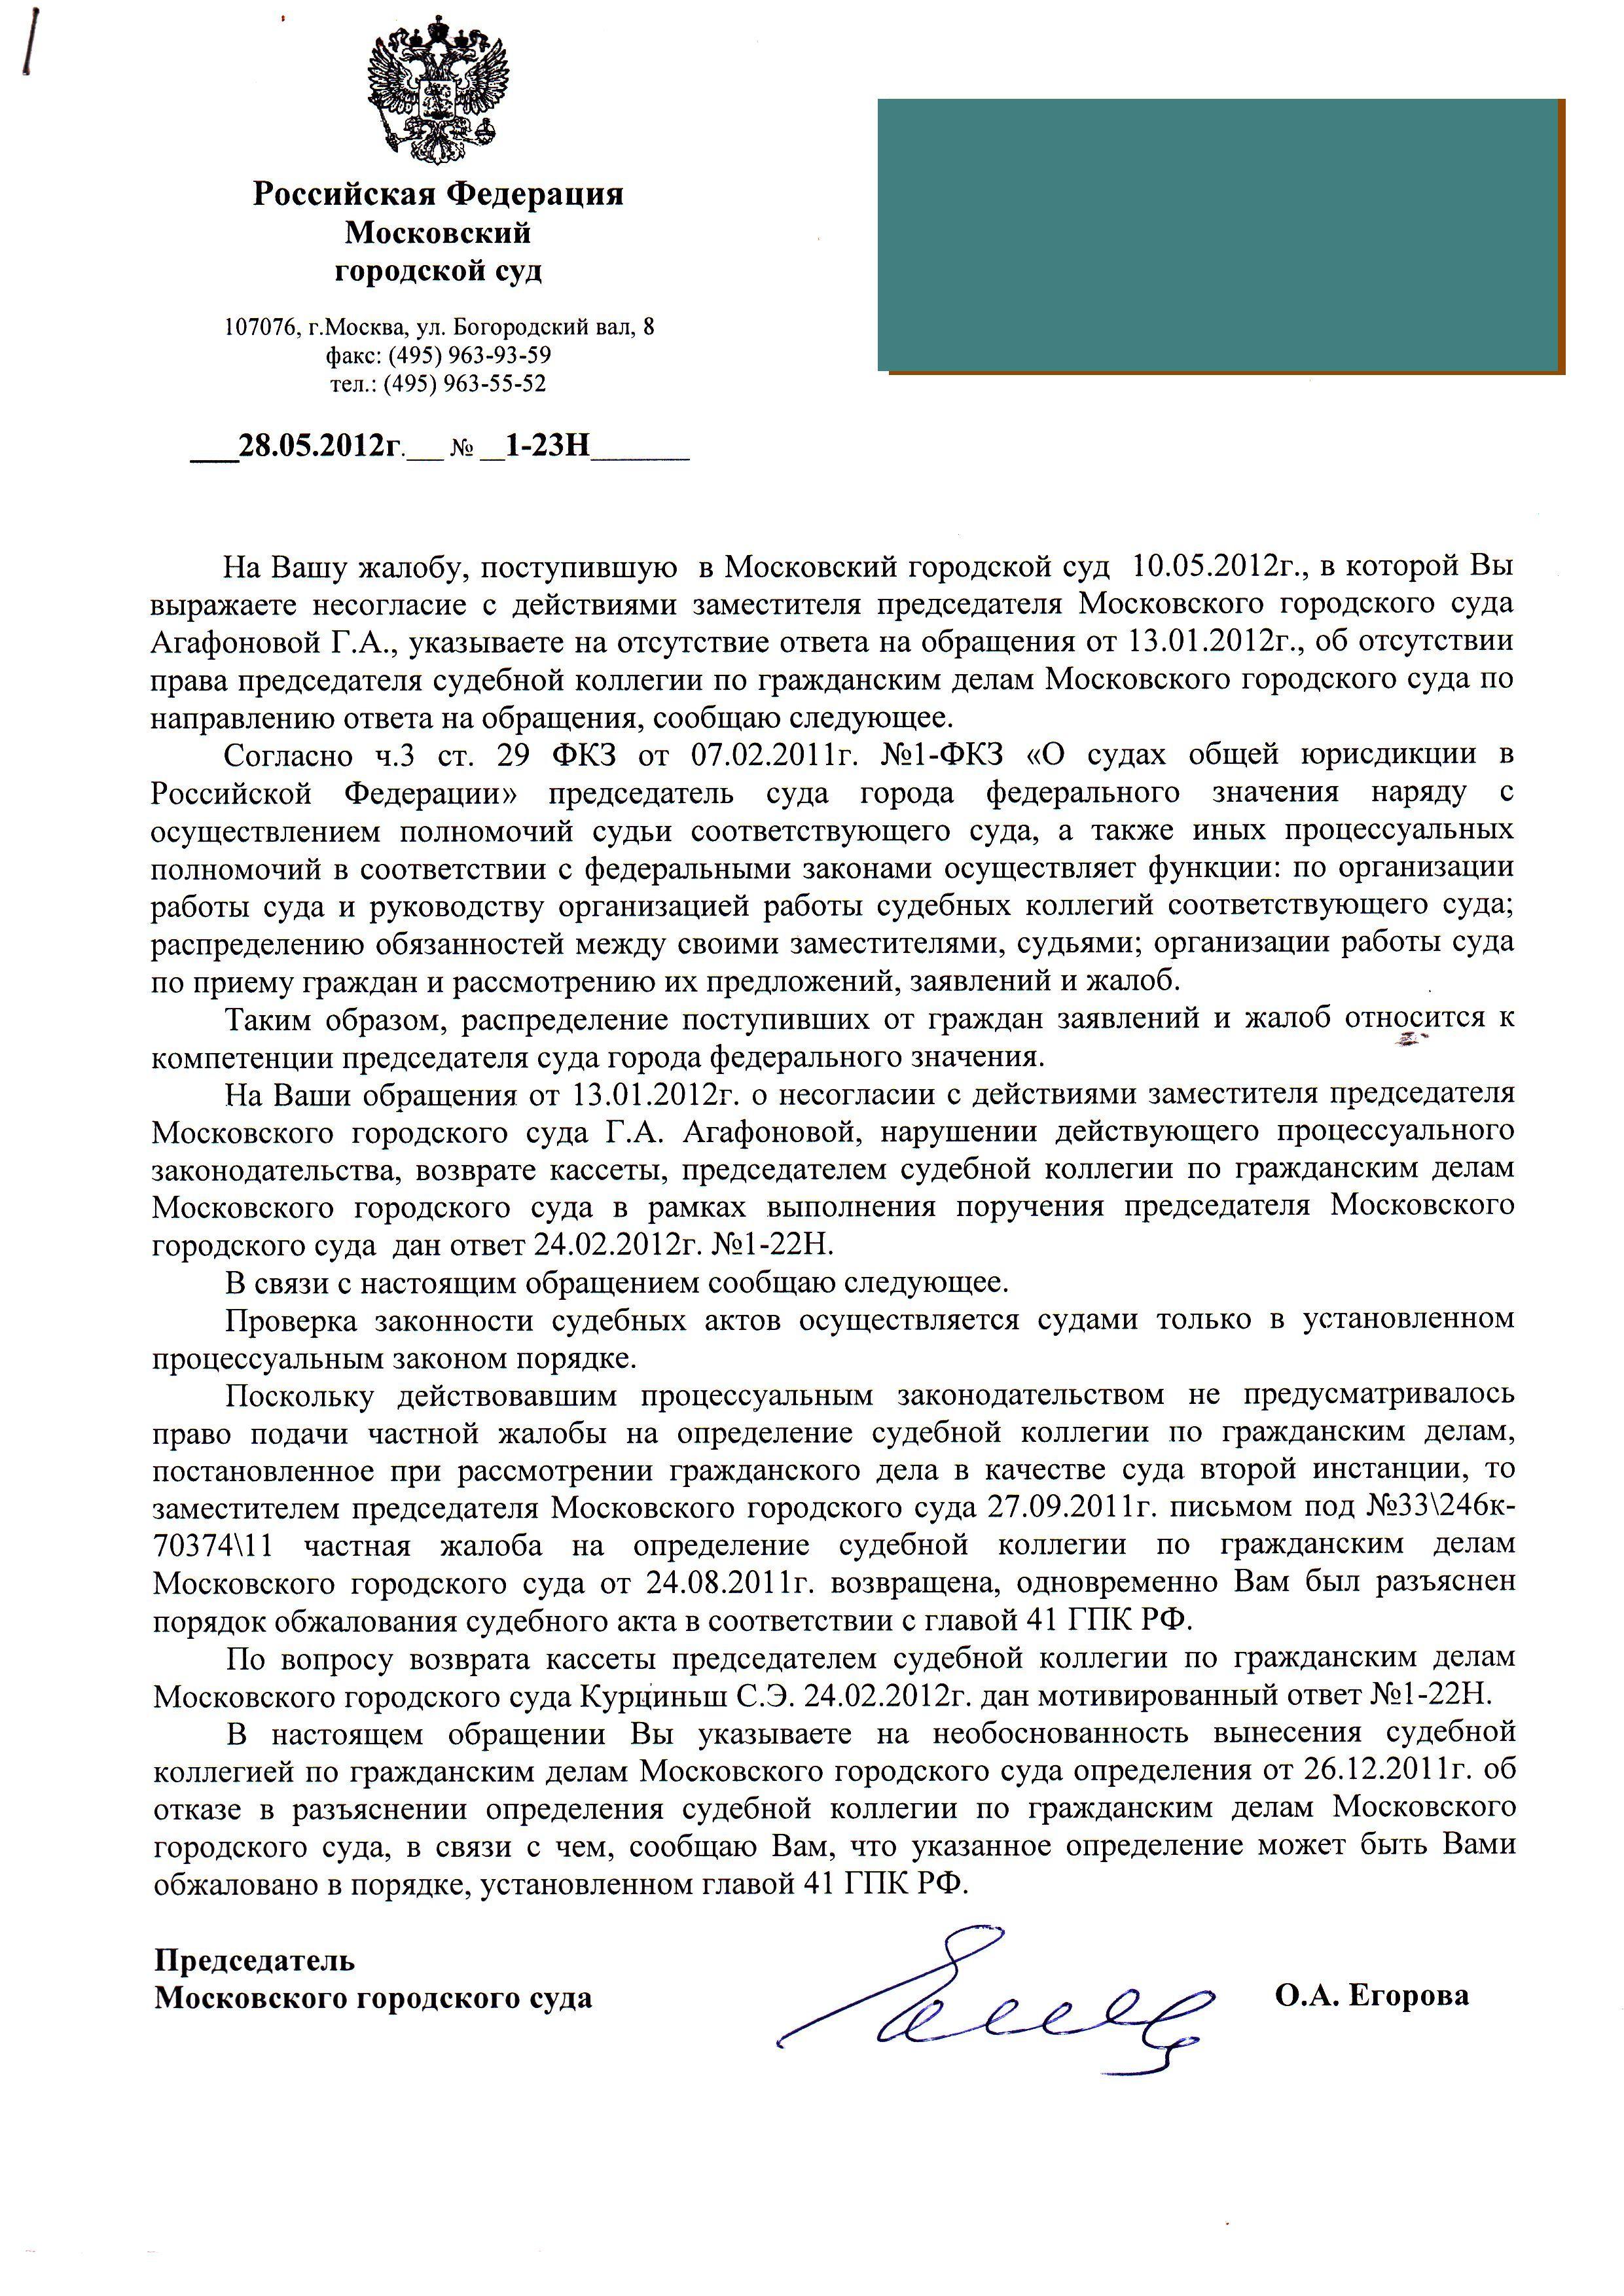 Жалобу на судью москвы